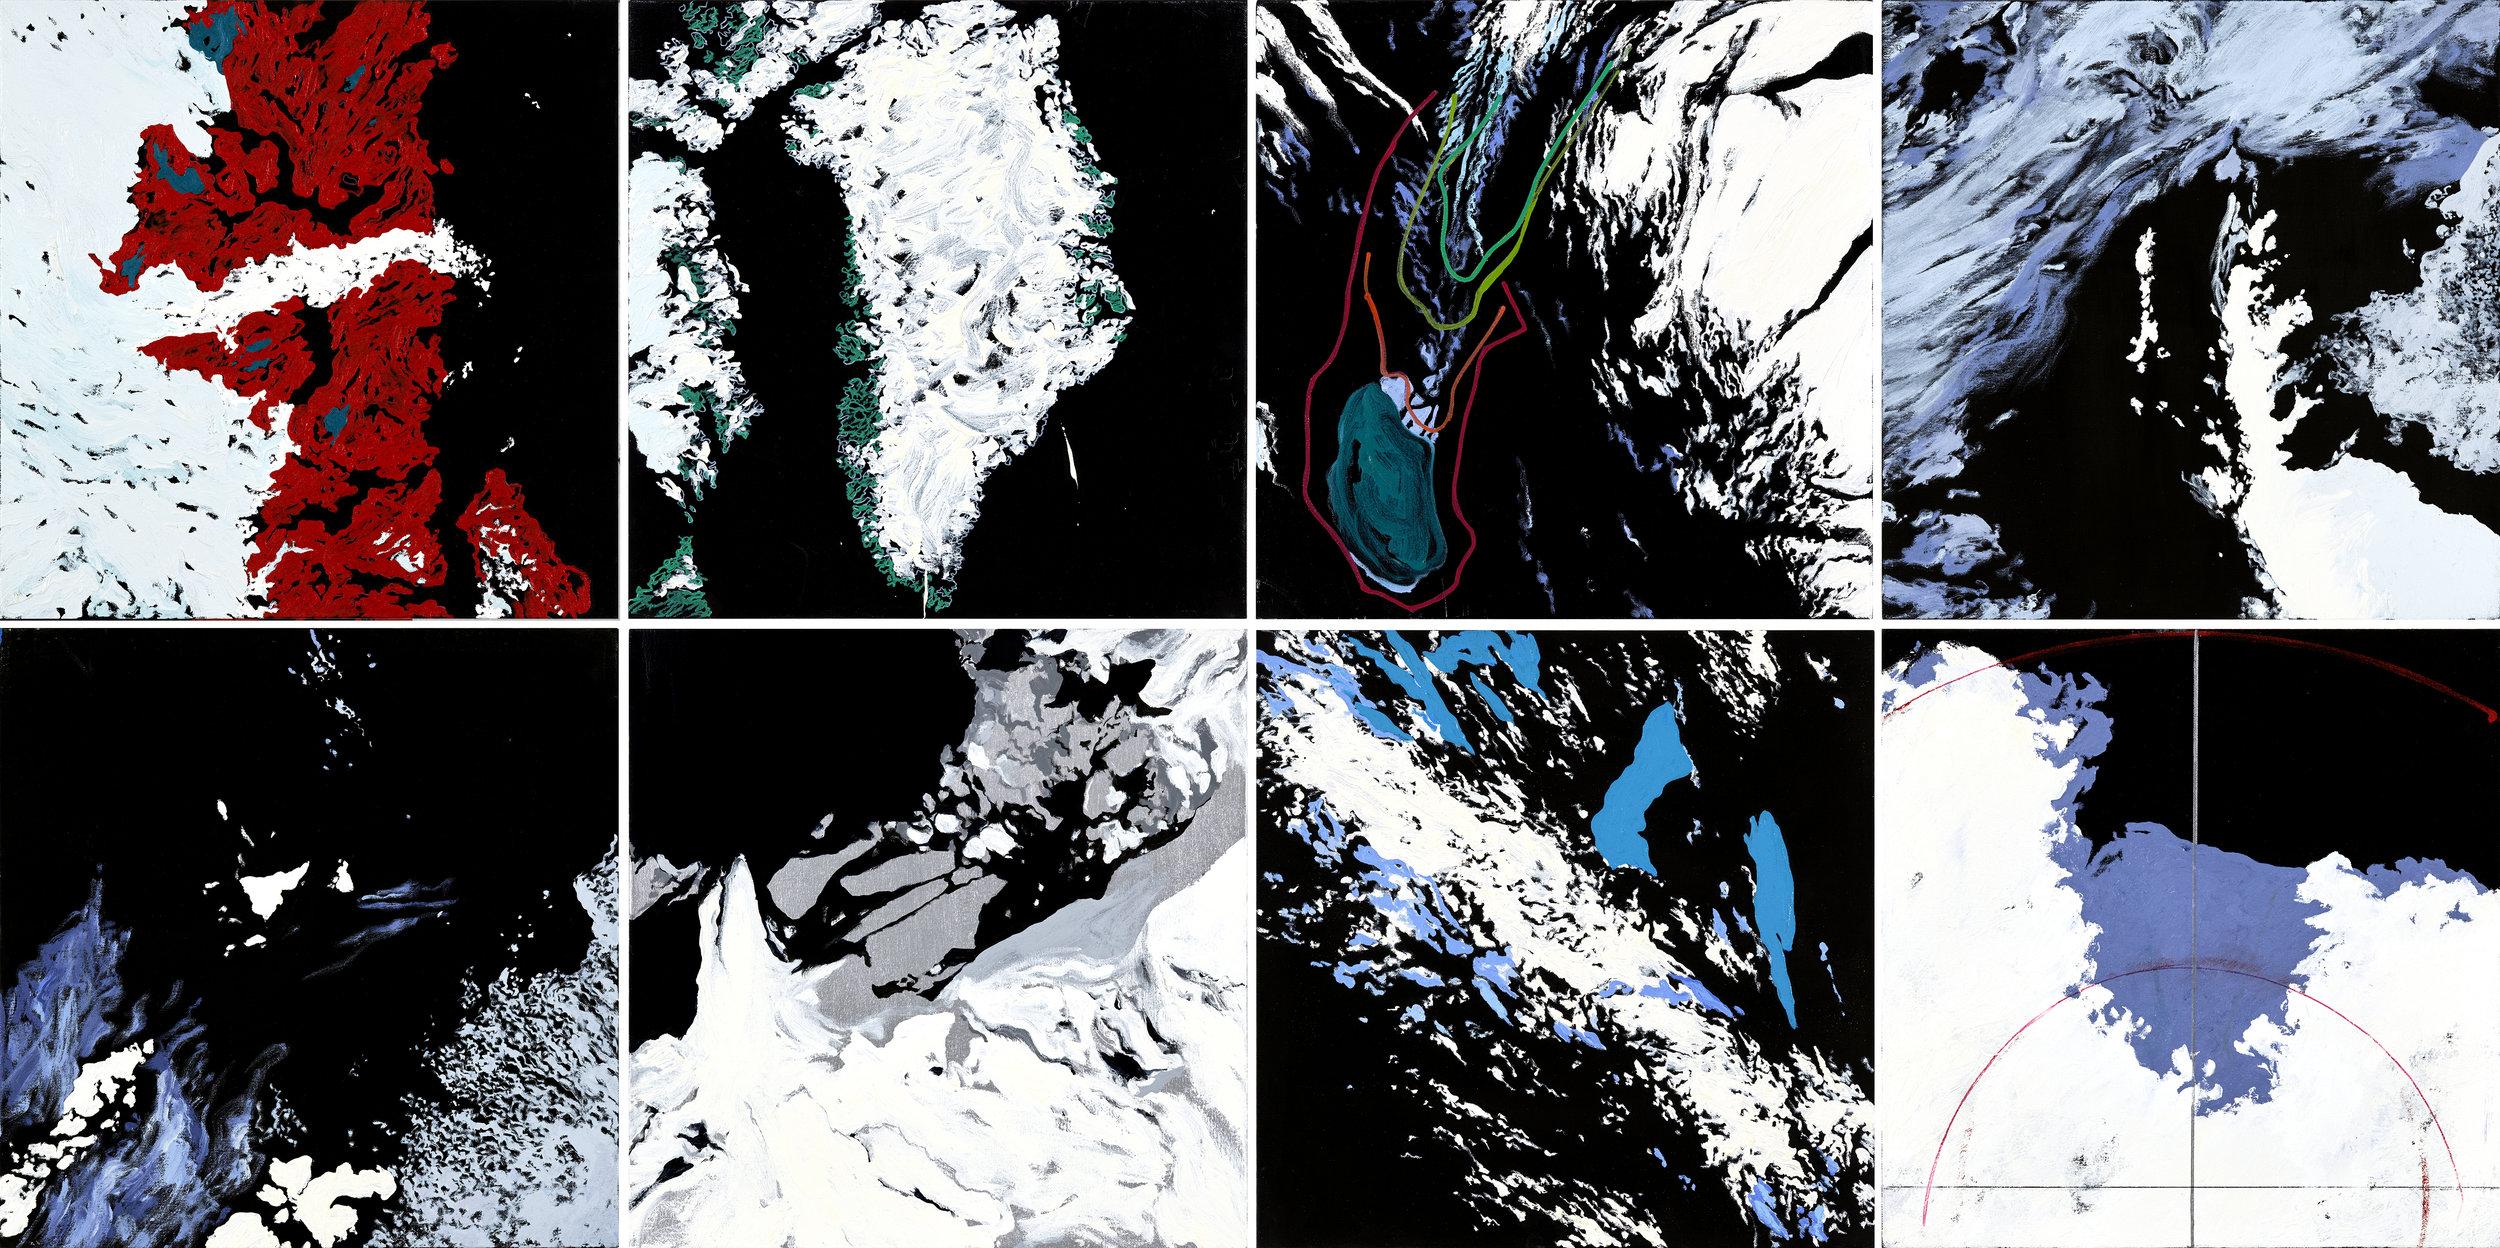 Landsat Series